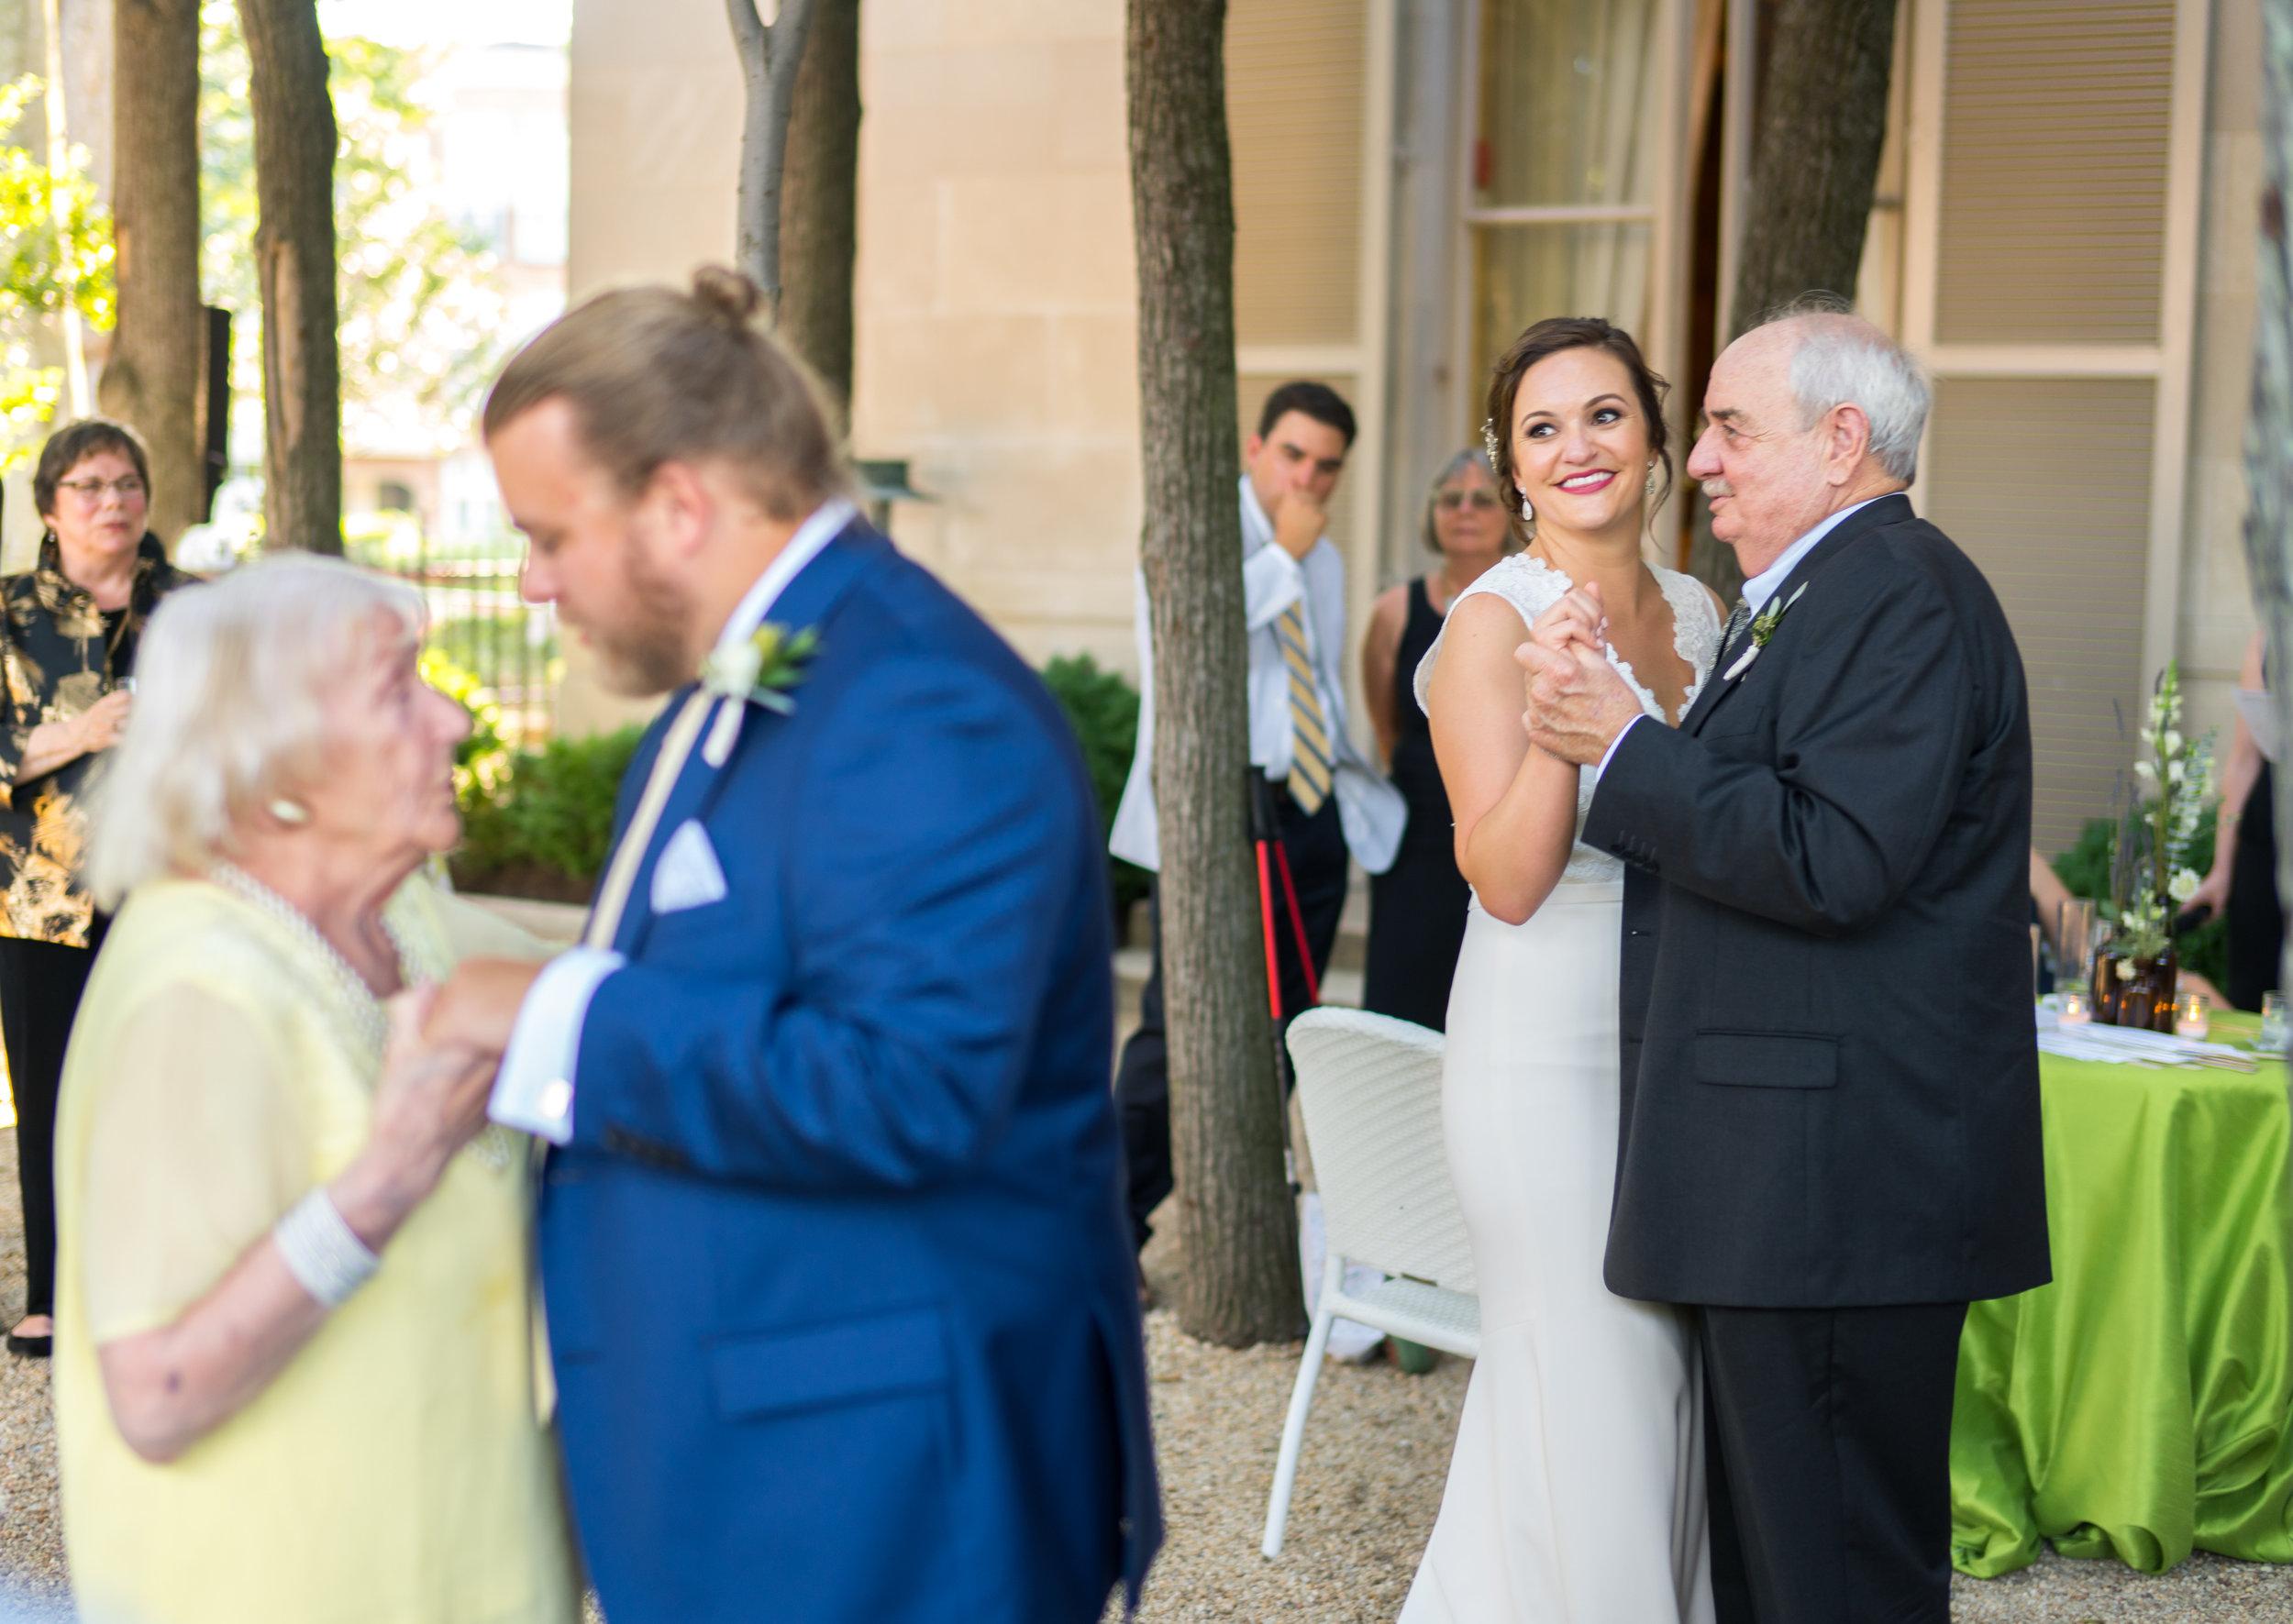 Grandparents dancing at a wedding at meridian house international